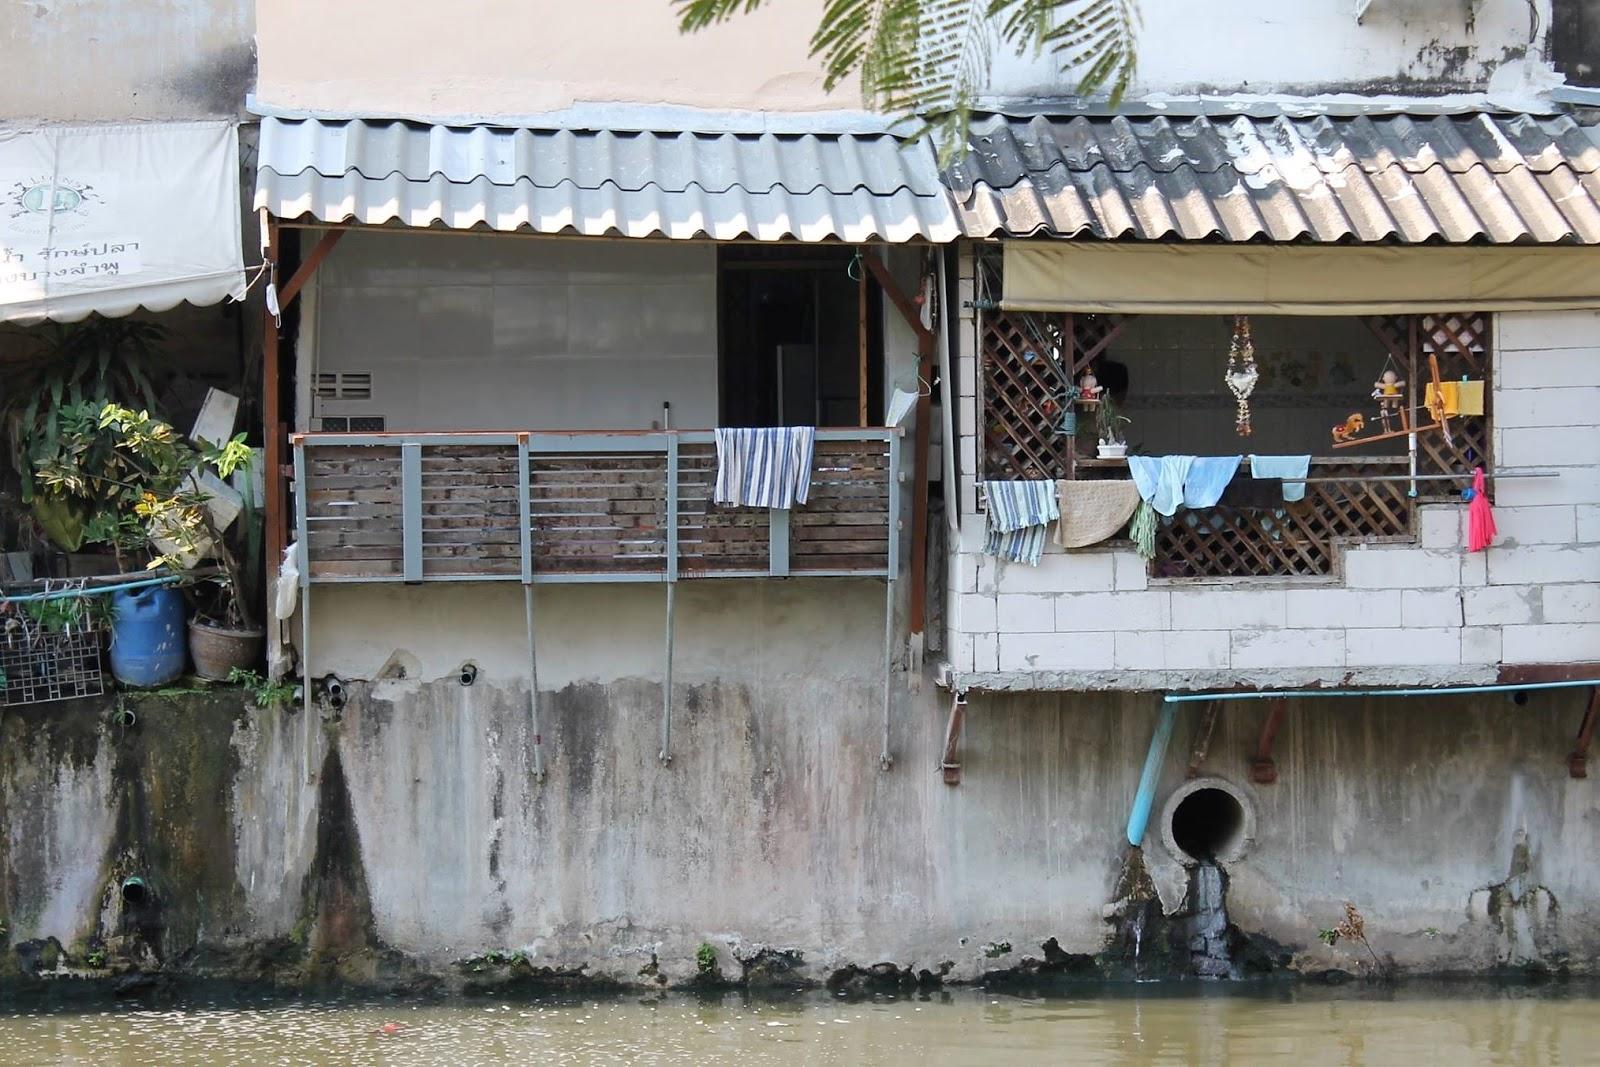 canale bangkok thailandia